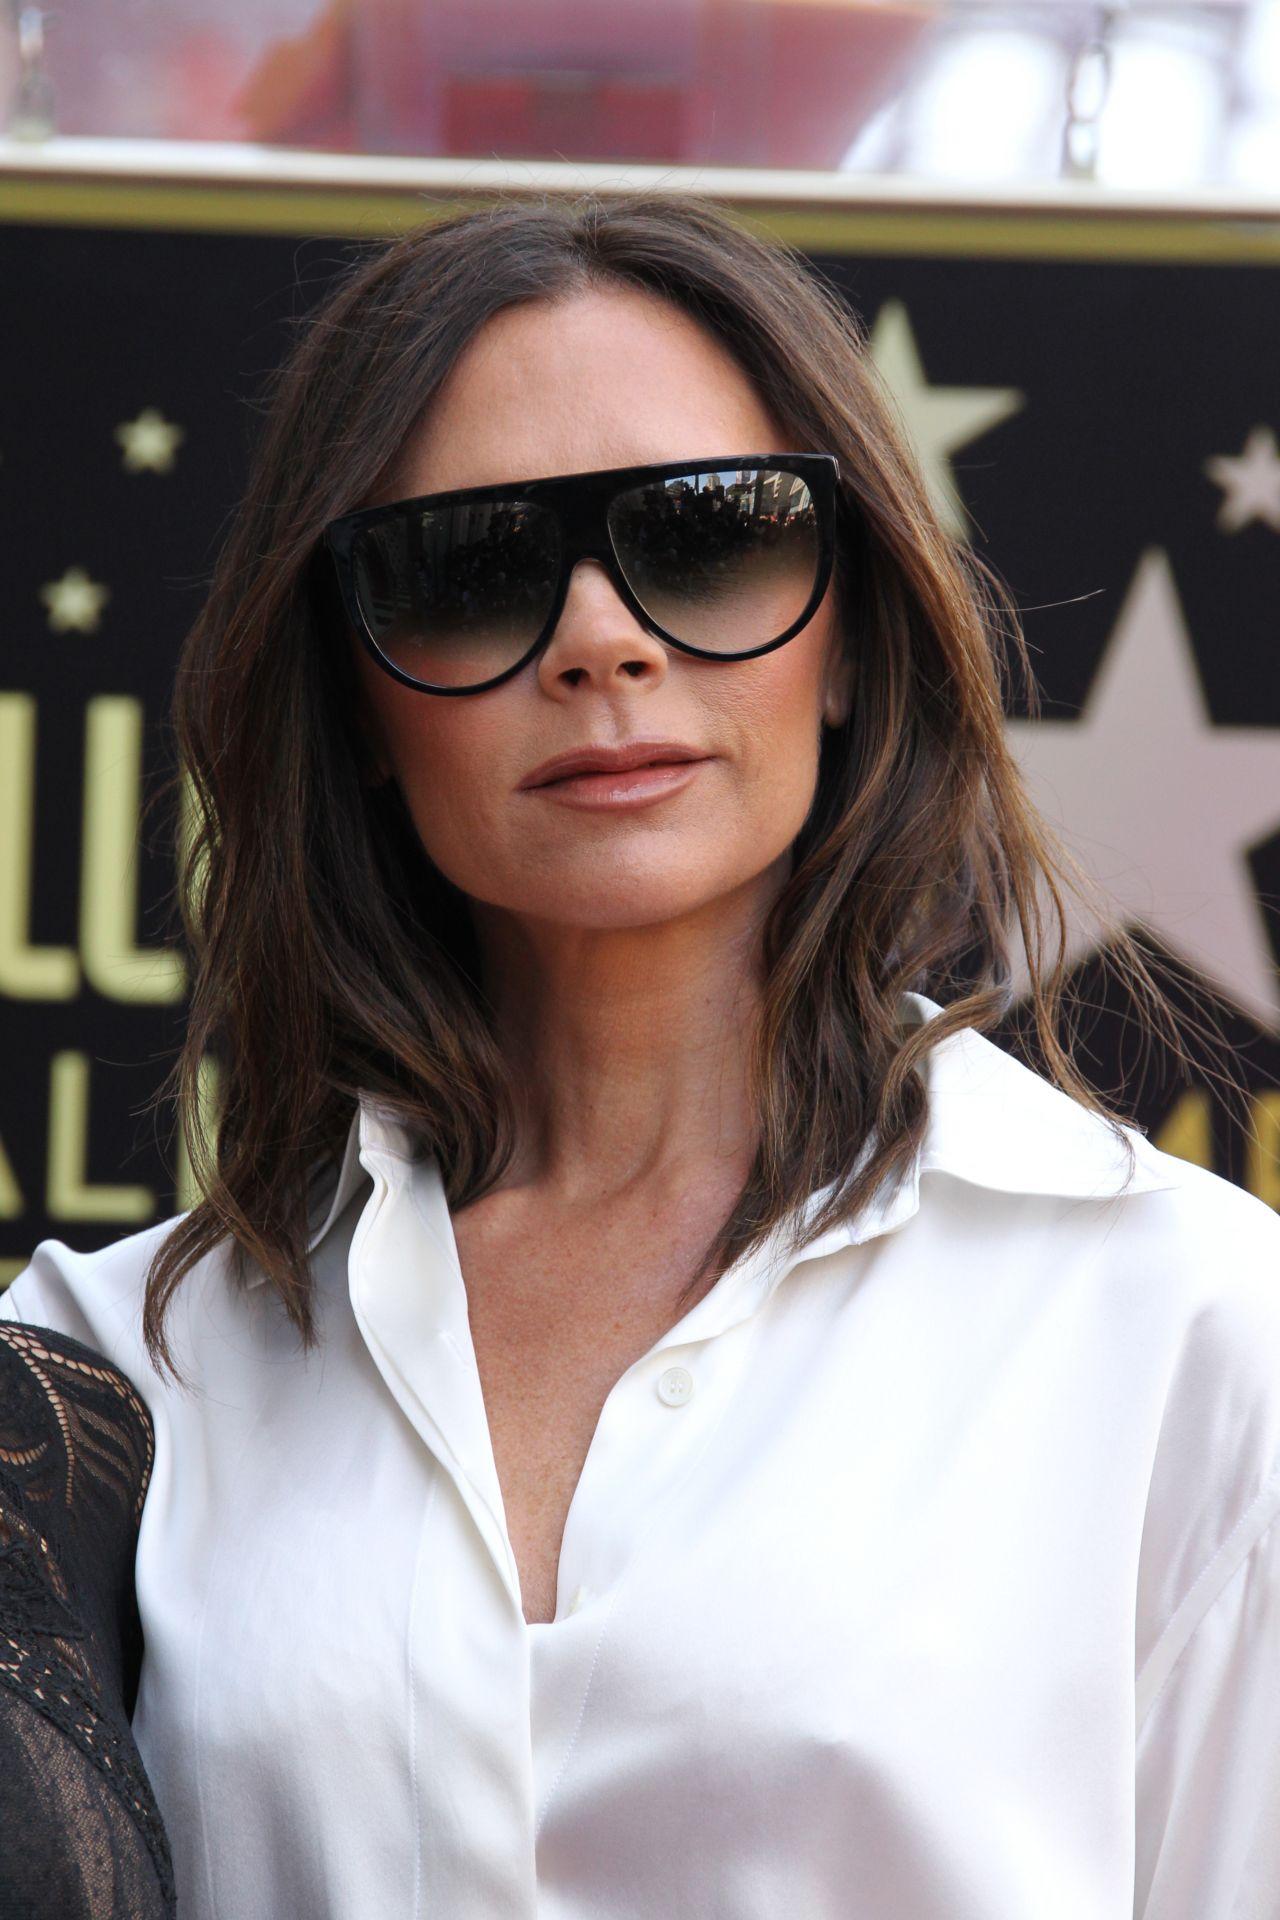 Victoria Beckham – Eva Longoria Hollywood Walk of Fame in LA Victoria Beckham